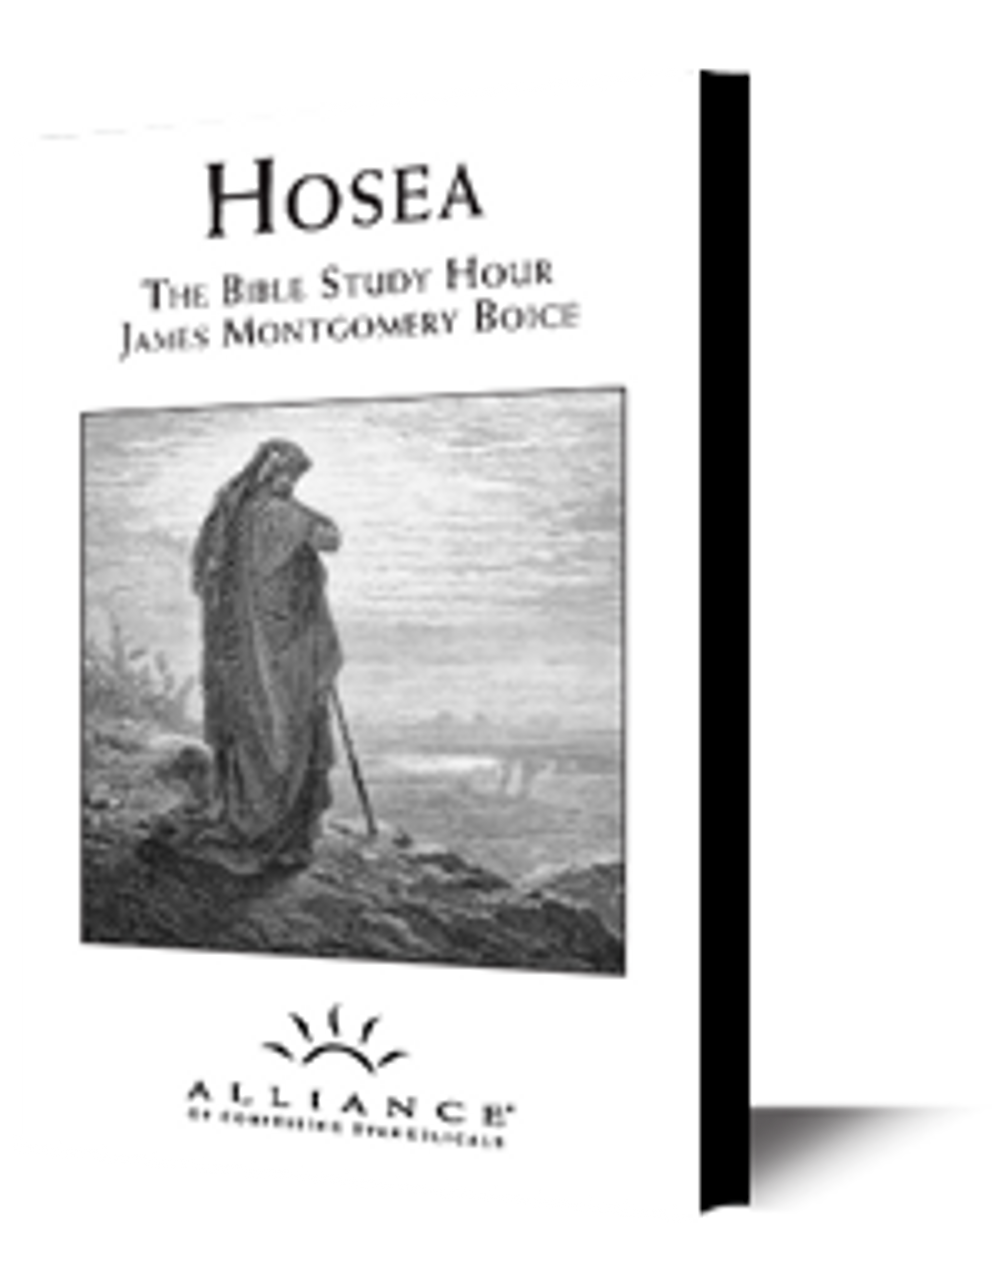 Hosea (mp3 downloads)